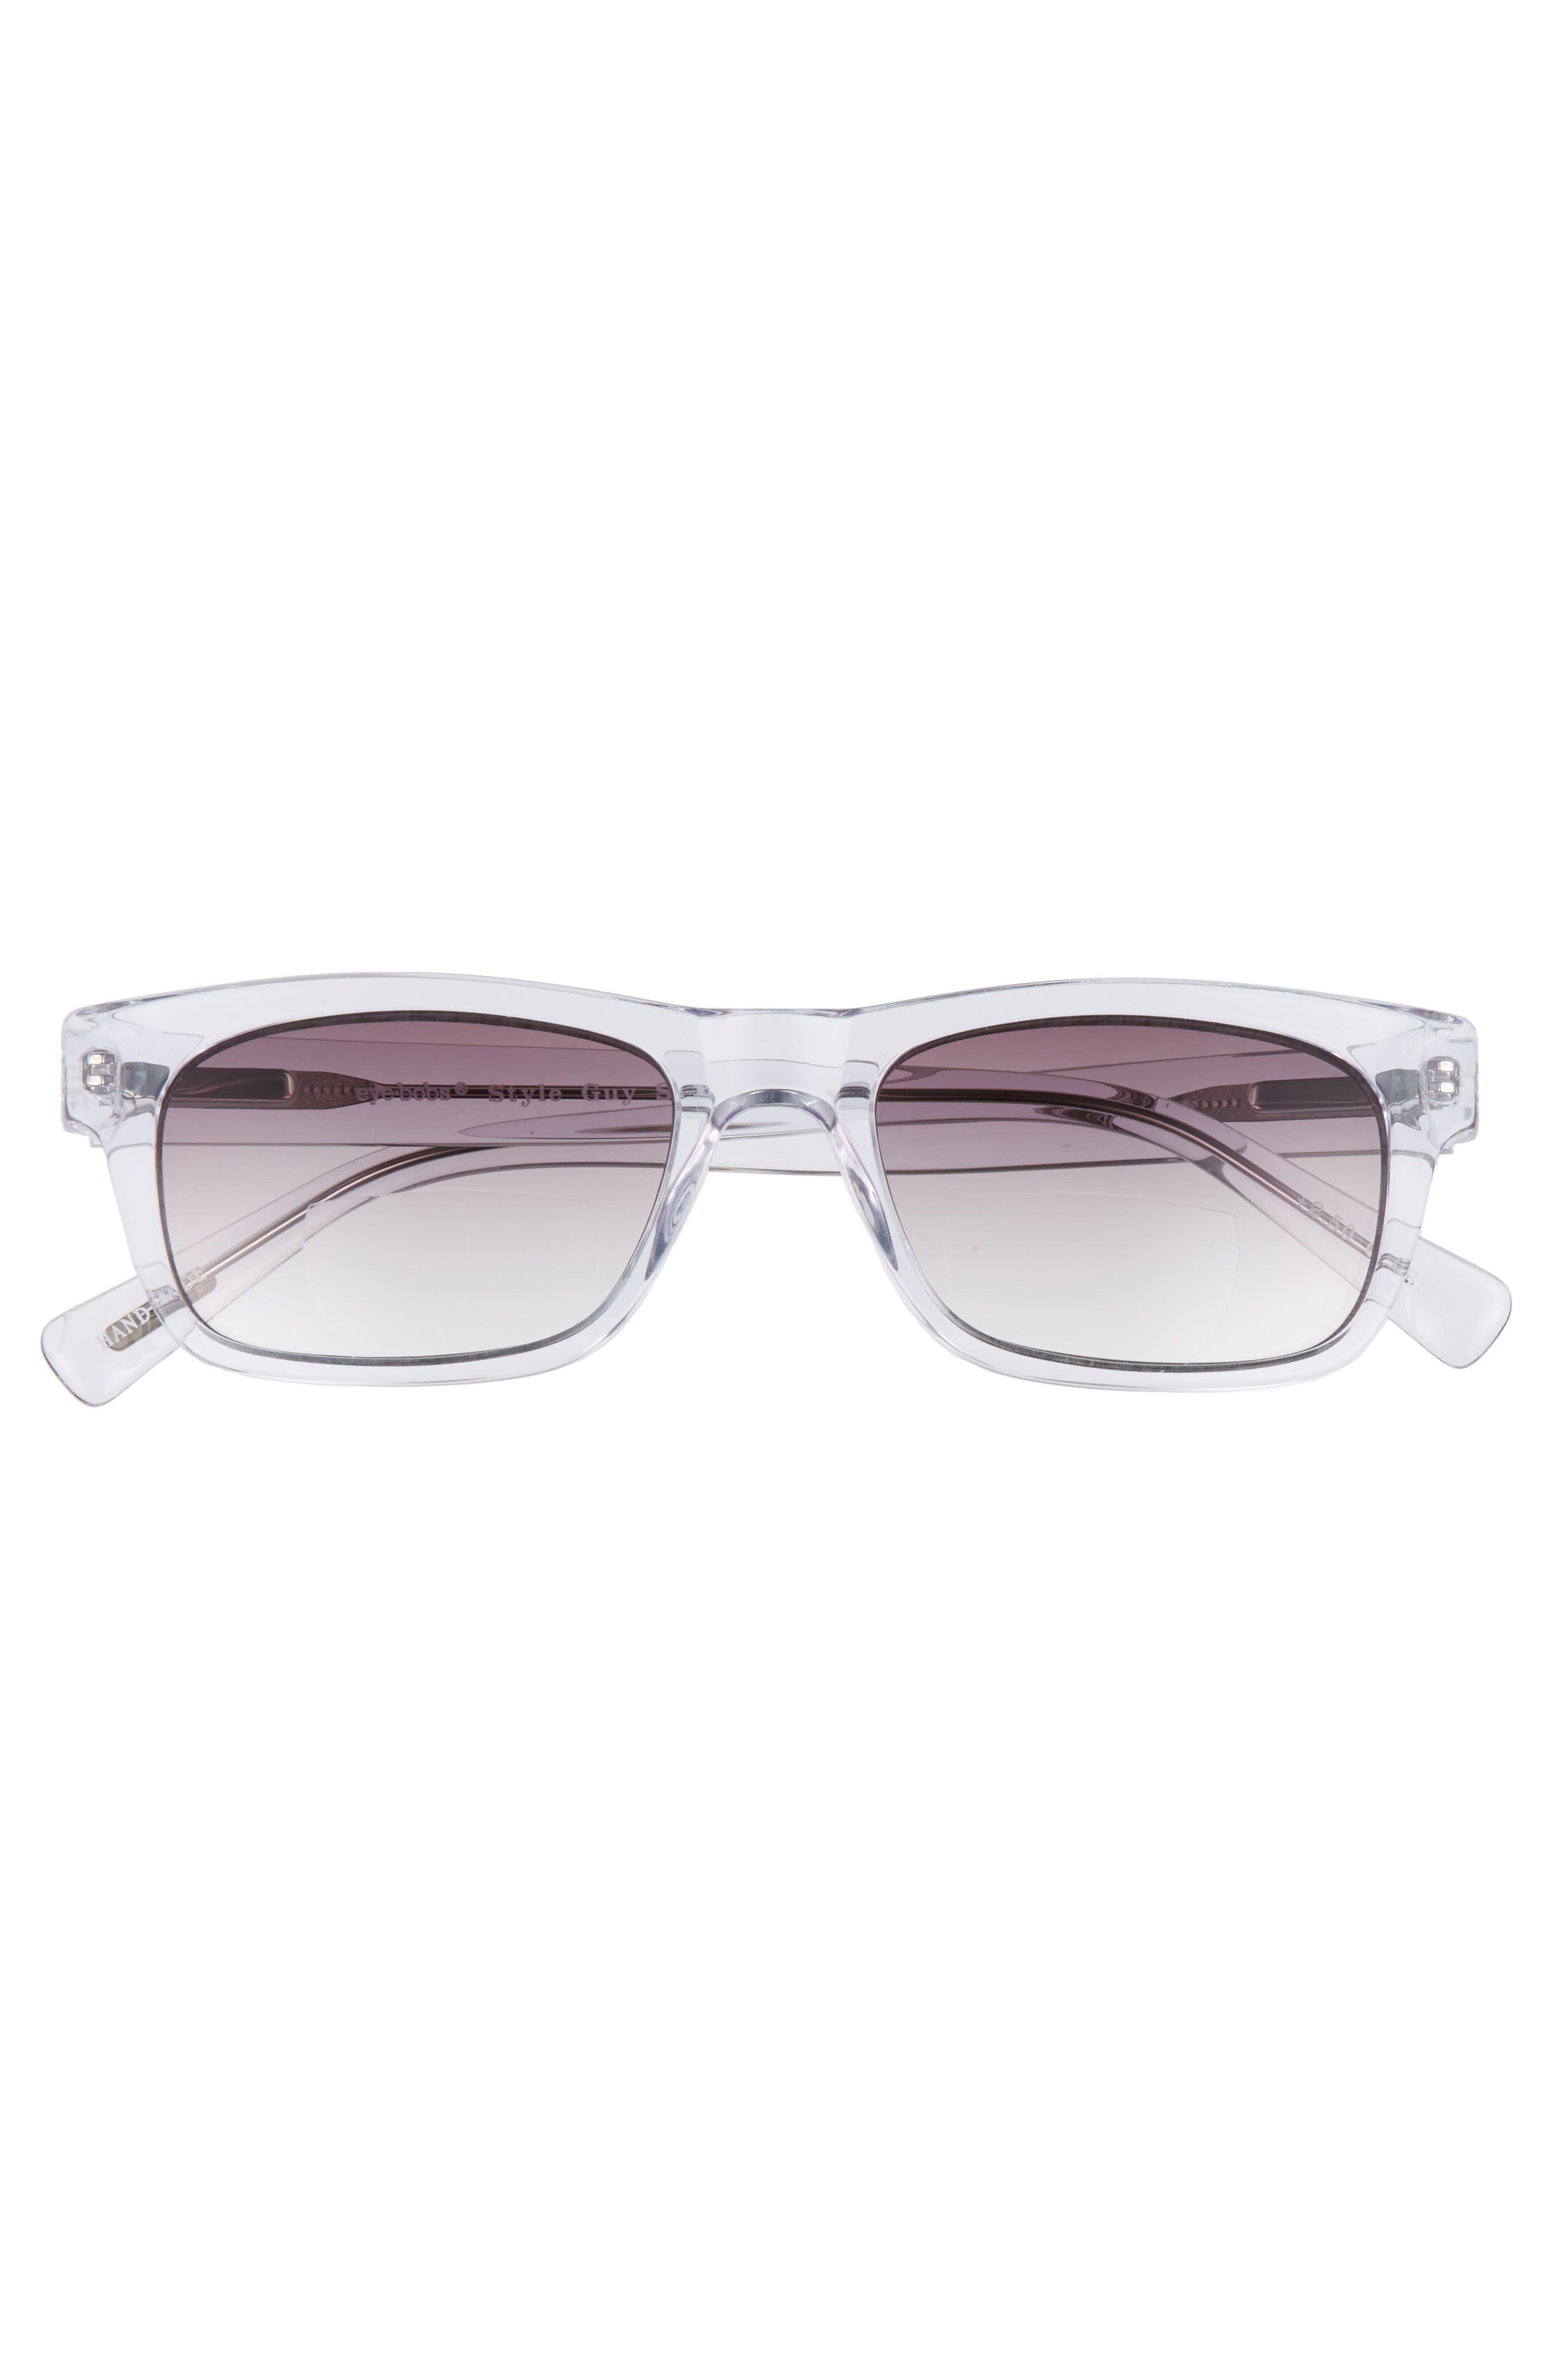 Style Guy Sun Reader 52mm Reading Sunglasses,                             Alternate thumbnail 2, color,                             160